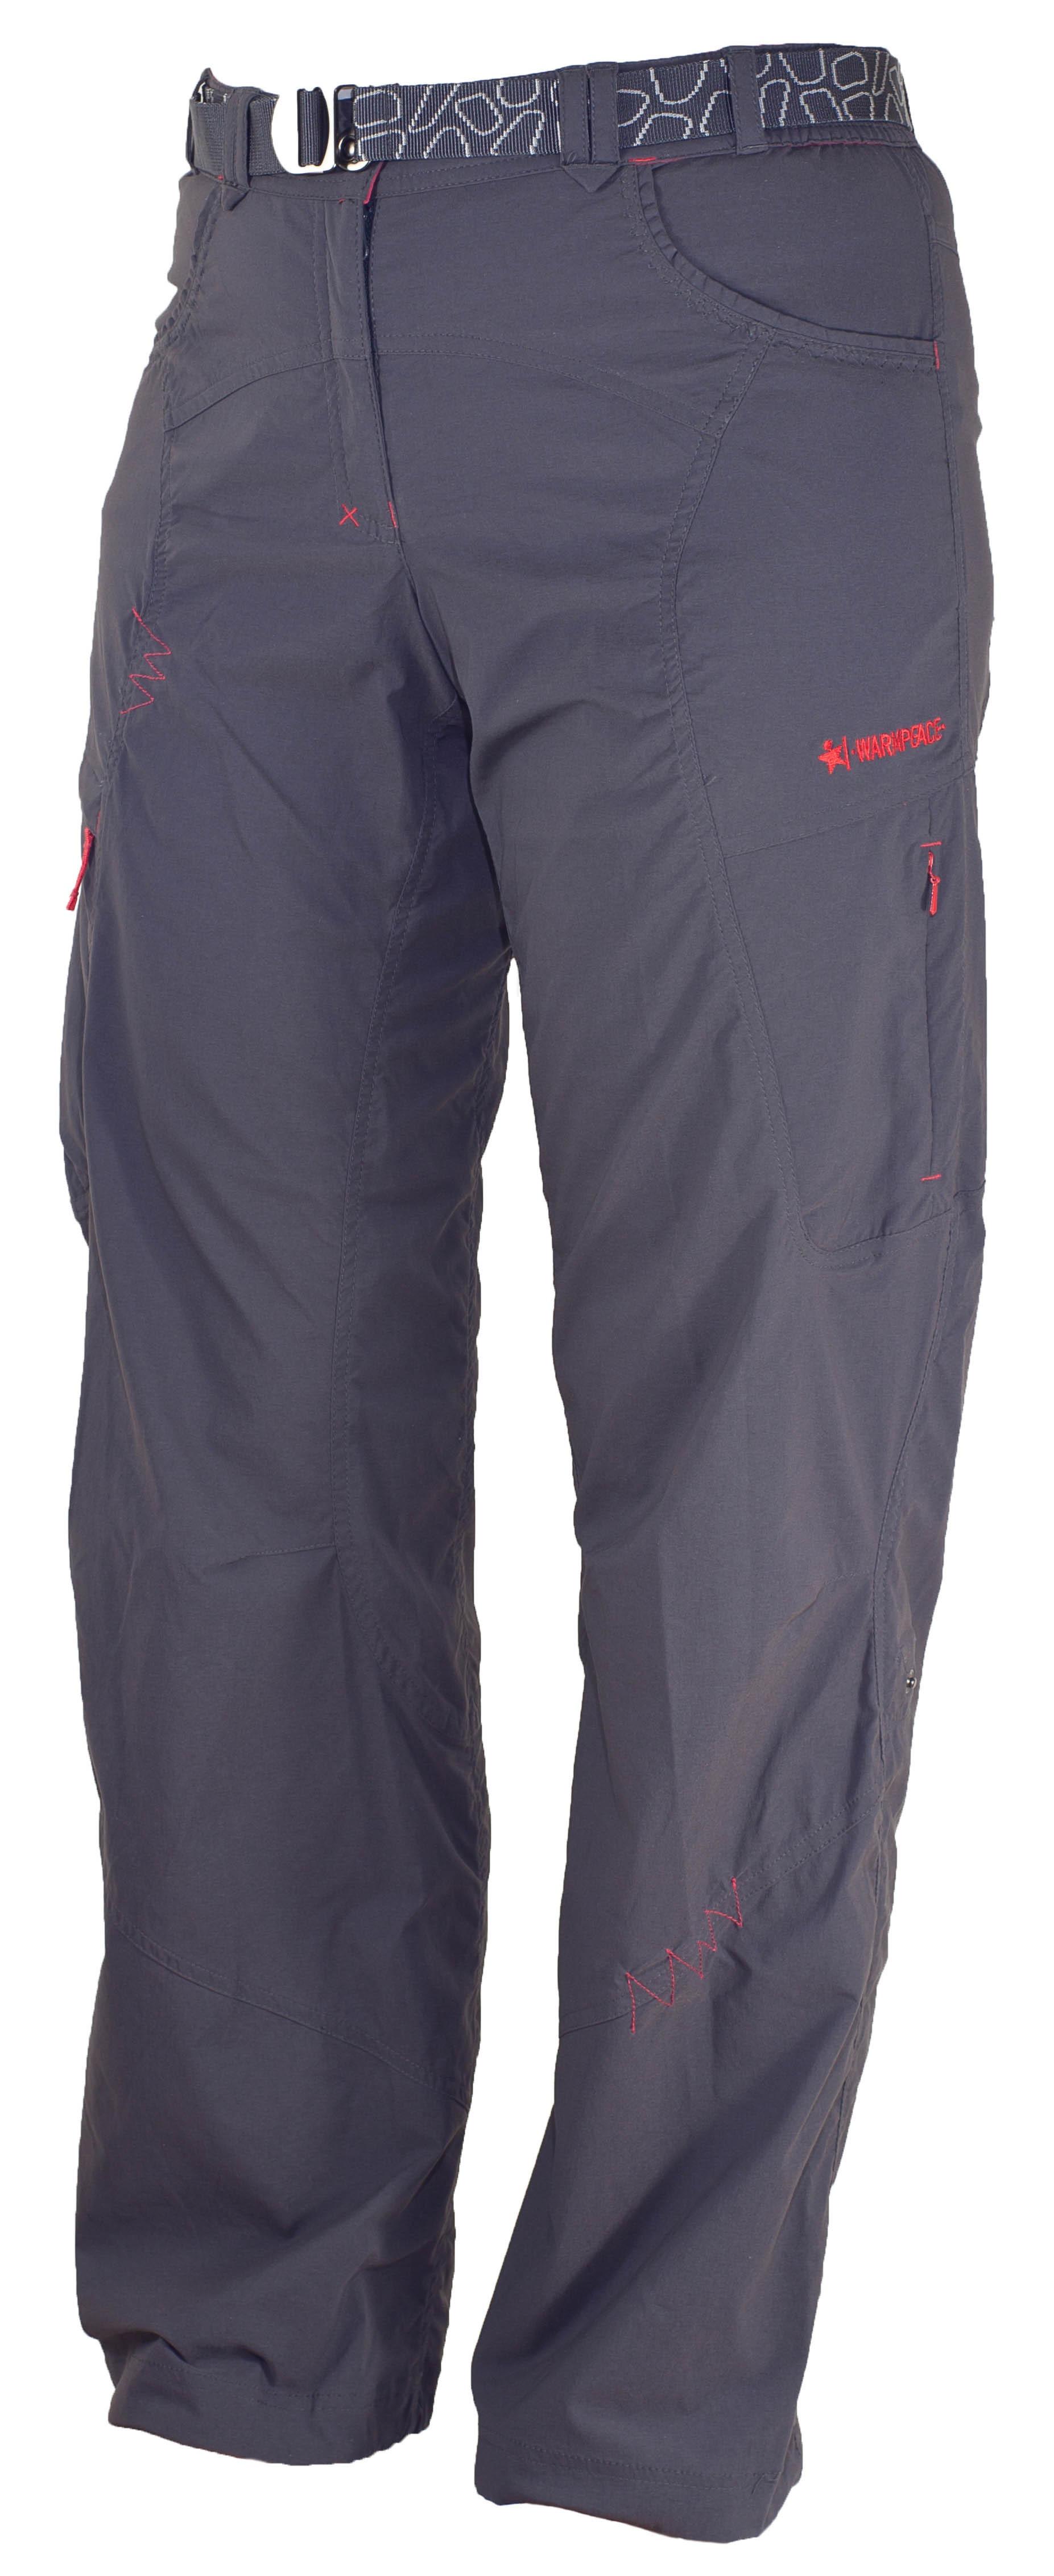 Pantaloni Warmpeace Muriel Lady - Antracit